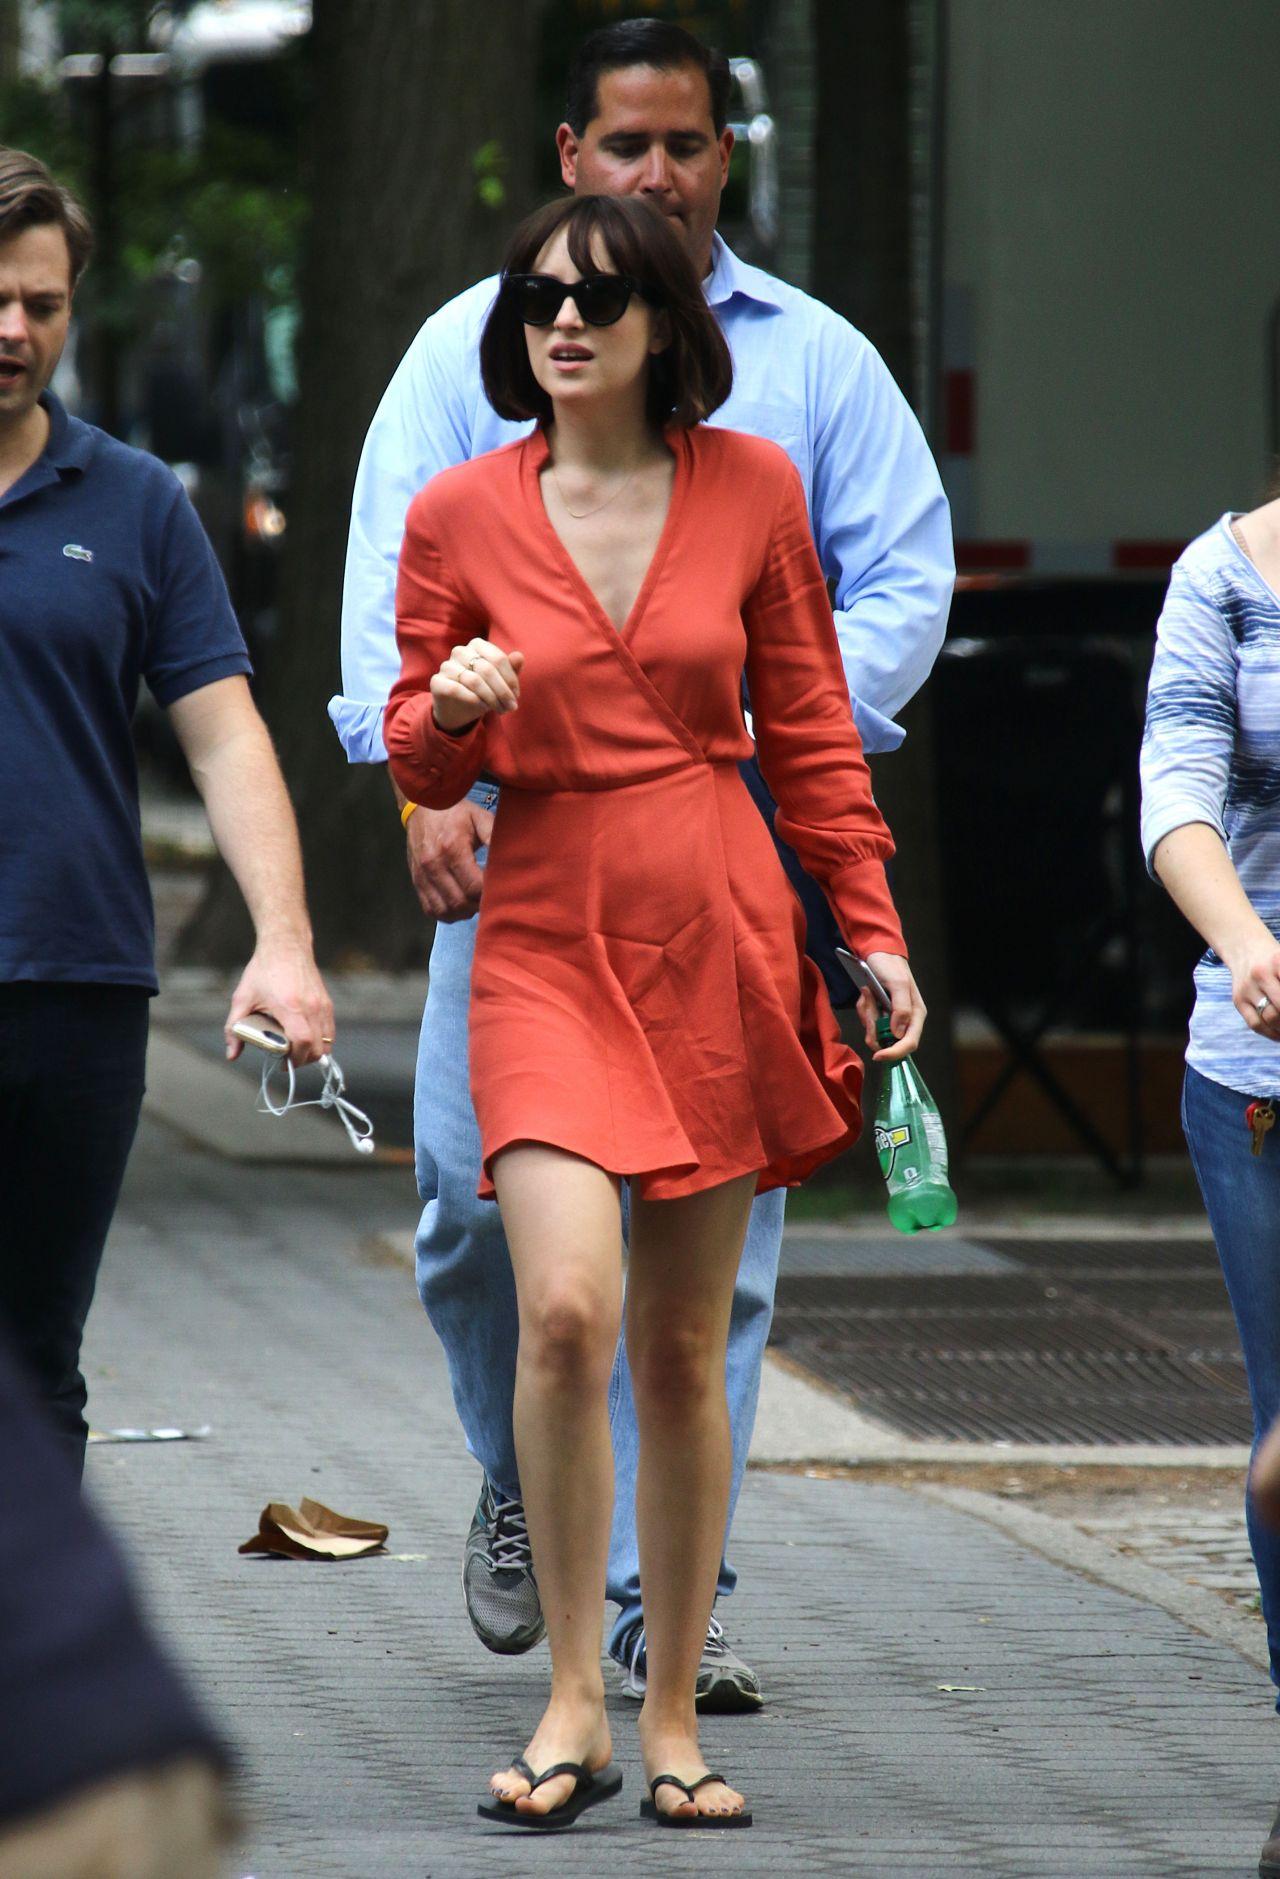 Dakota Johnson How To Be Single Movie Set In New York City, May 2015